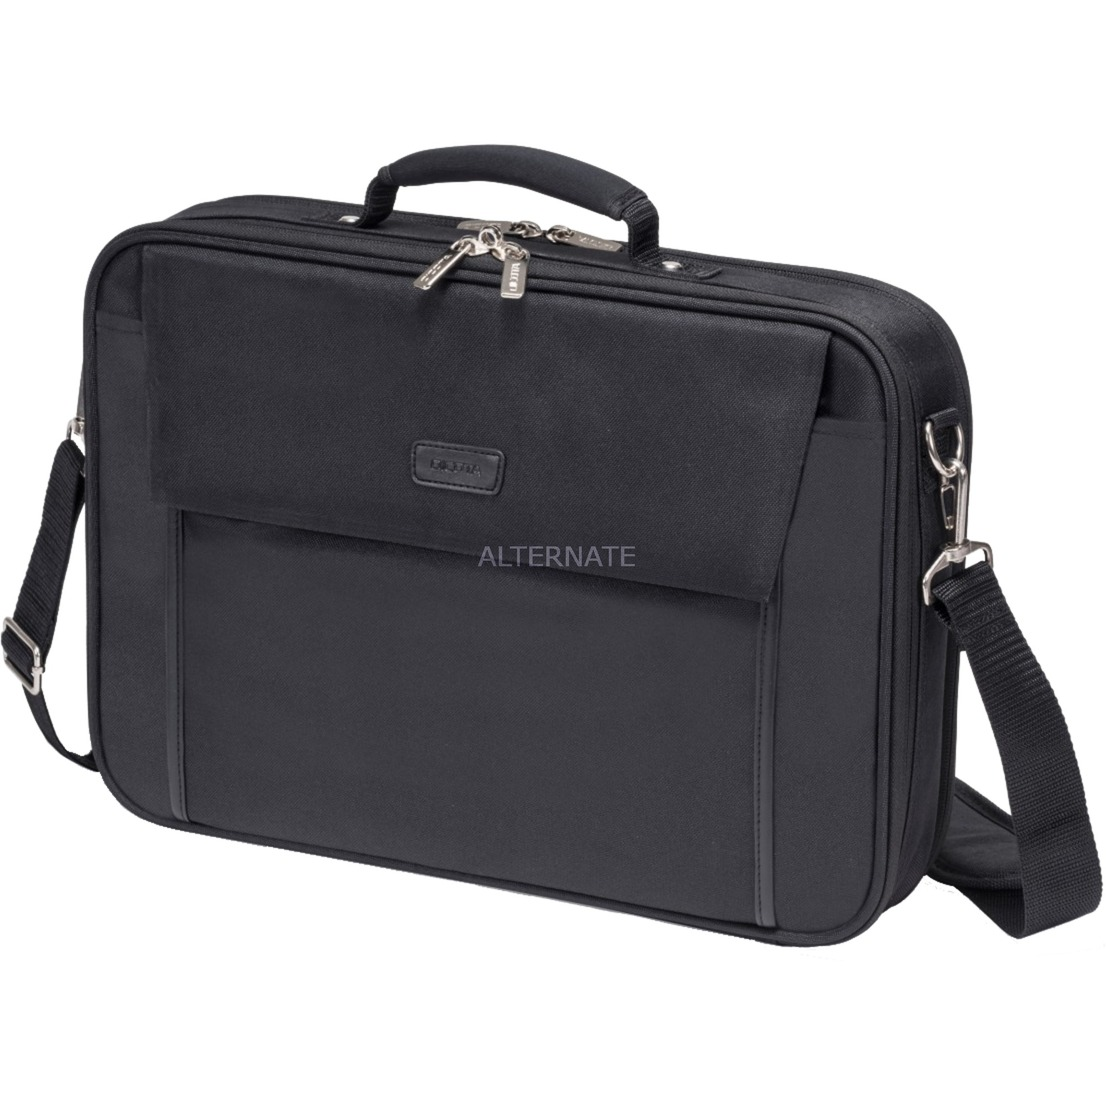 "D30492-V1 17.3"" Maletín Negro maletines para portátil, Bolsa"